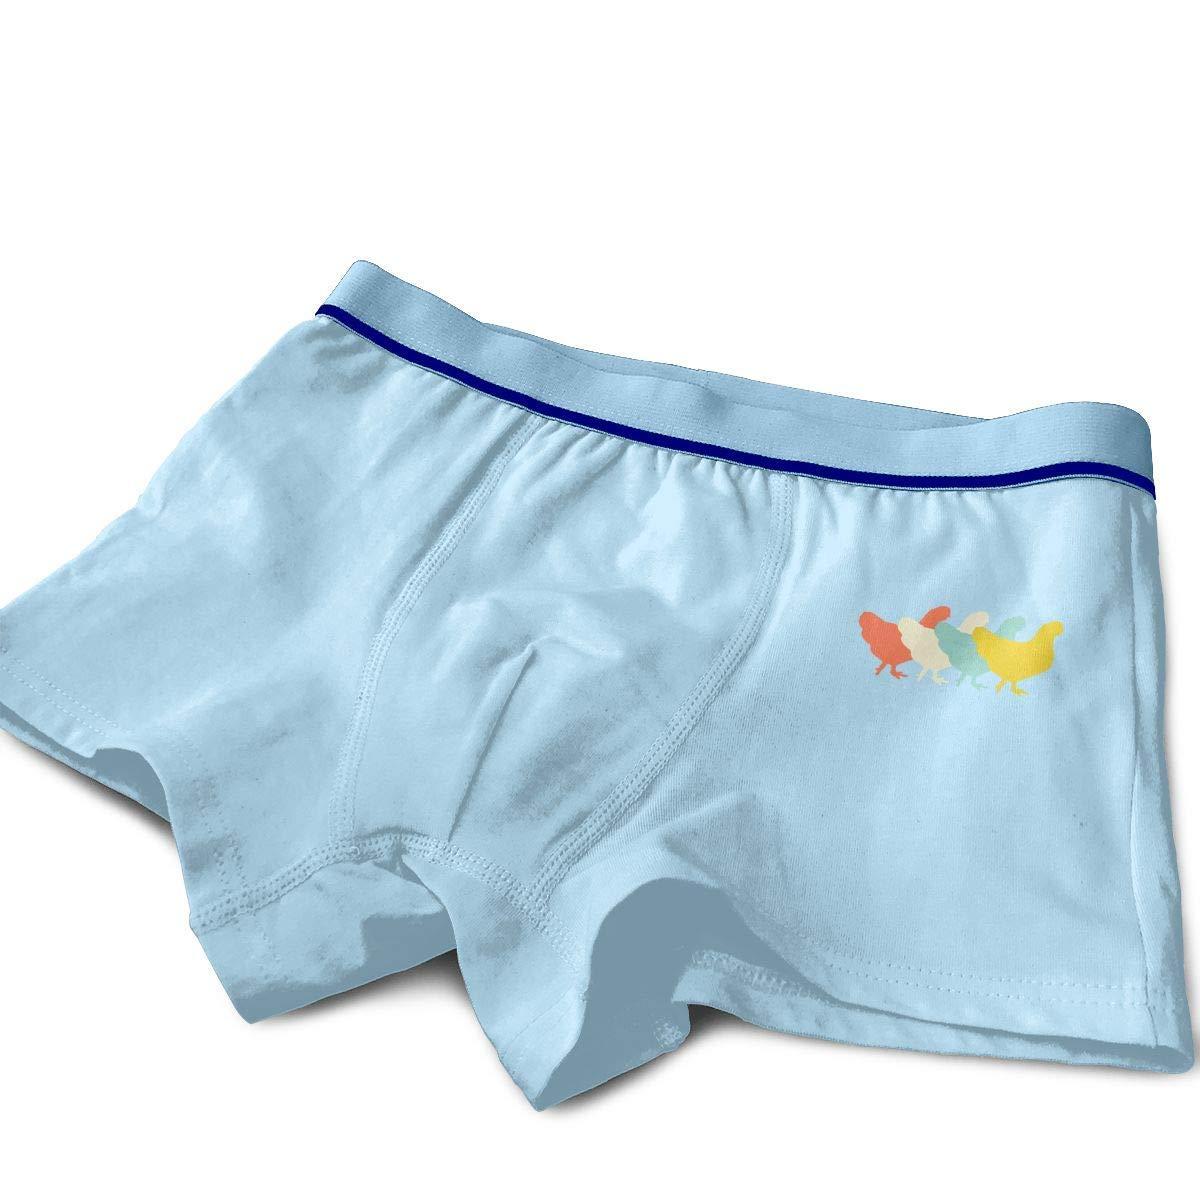 Pmftryuer Mens Underwear Boxer Briefs Underpants Light